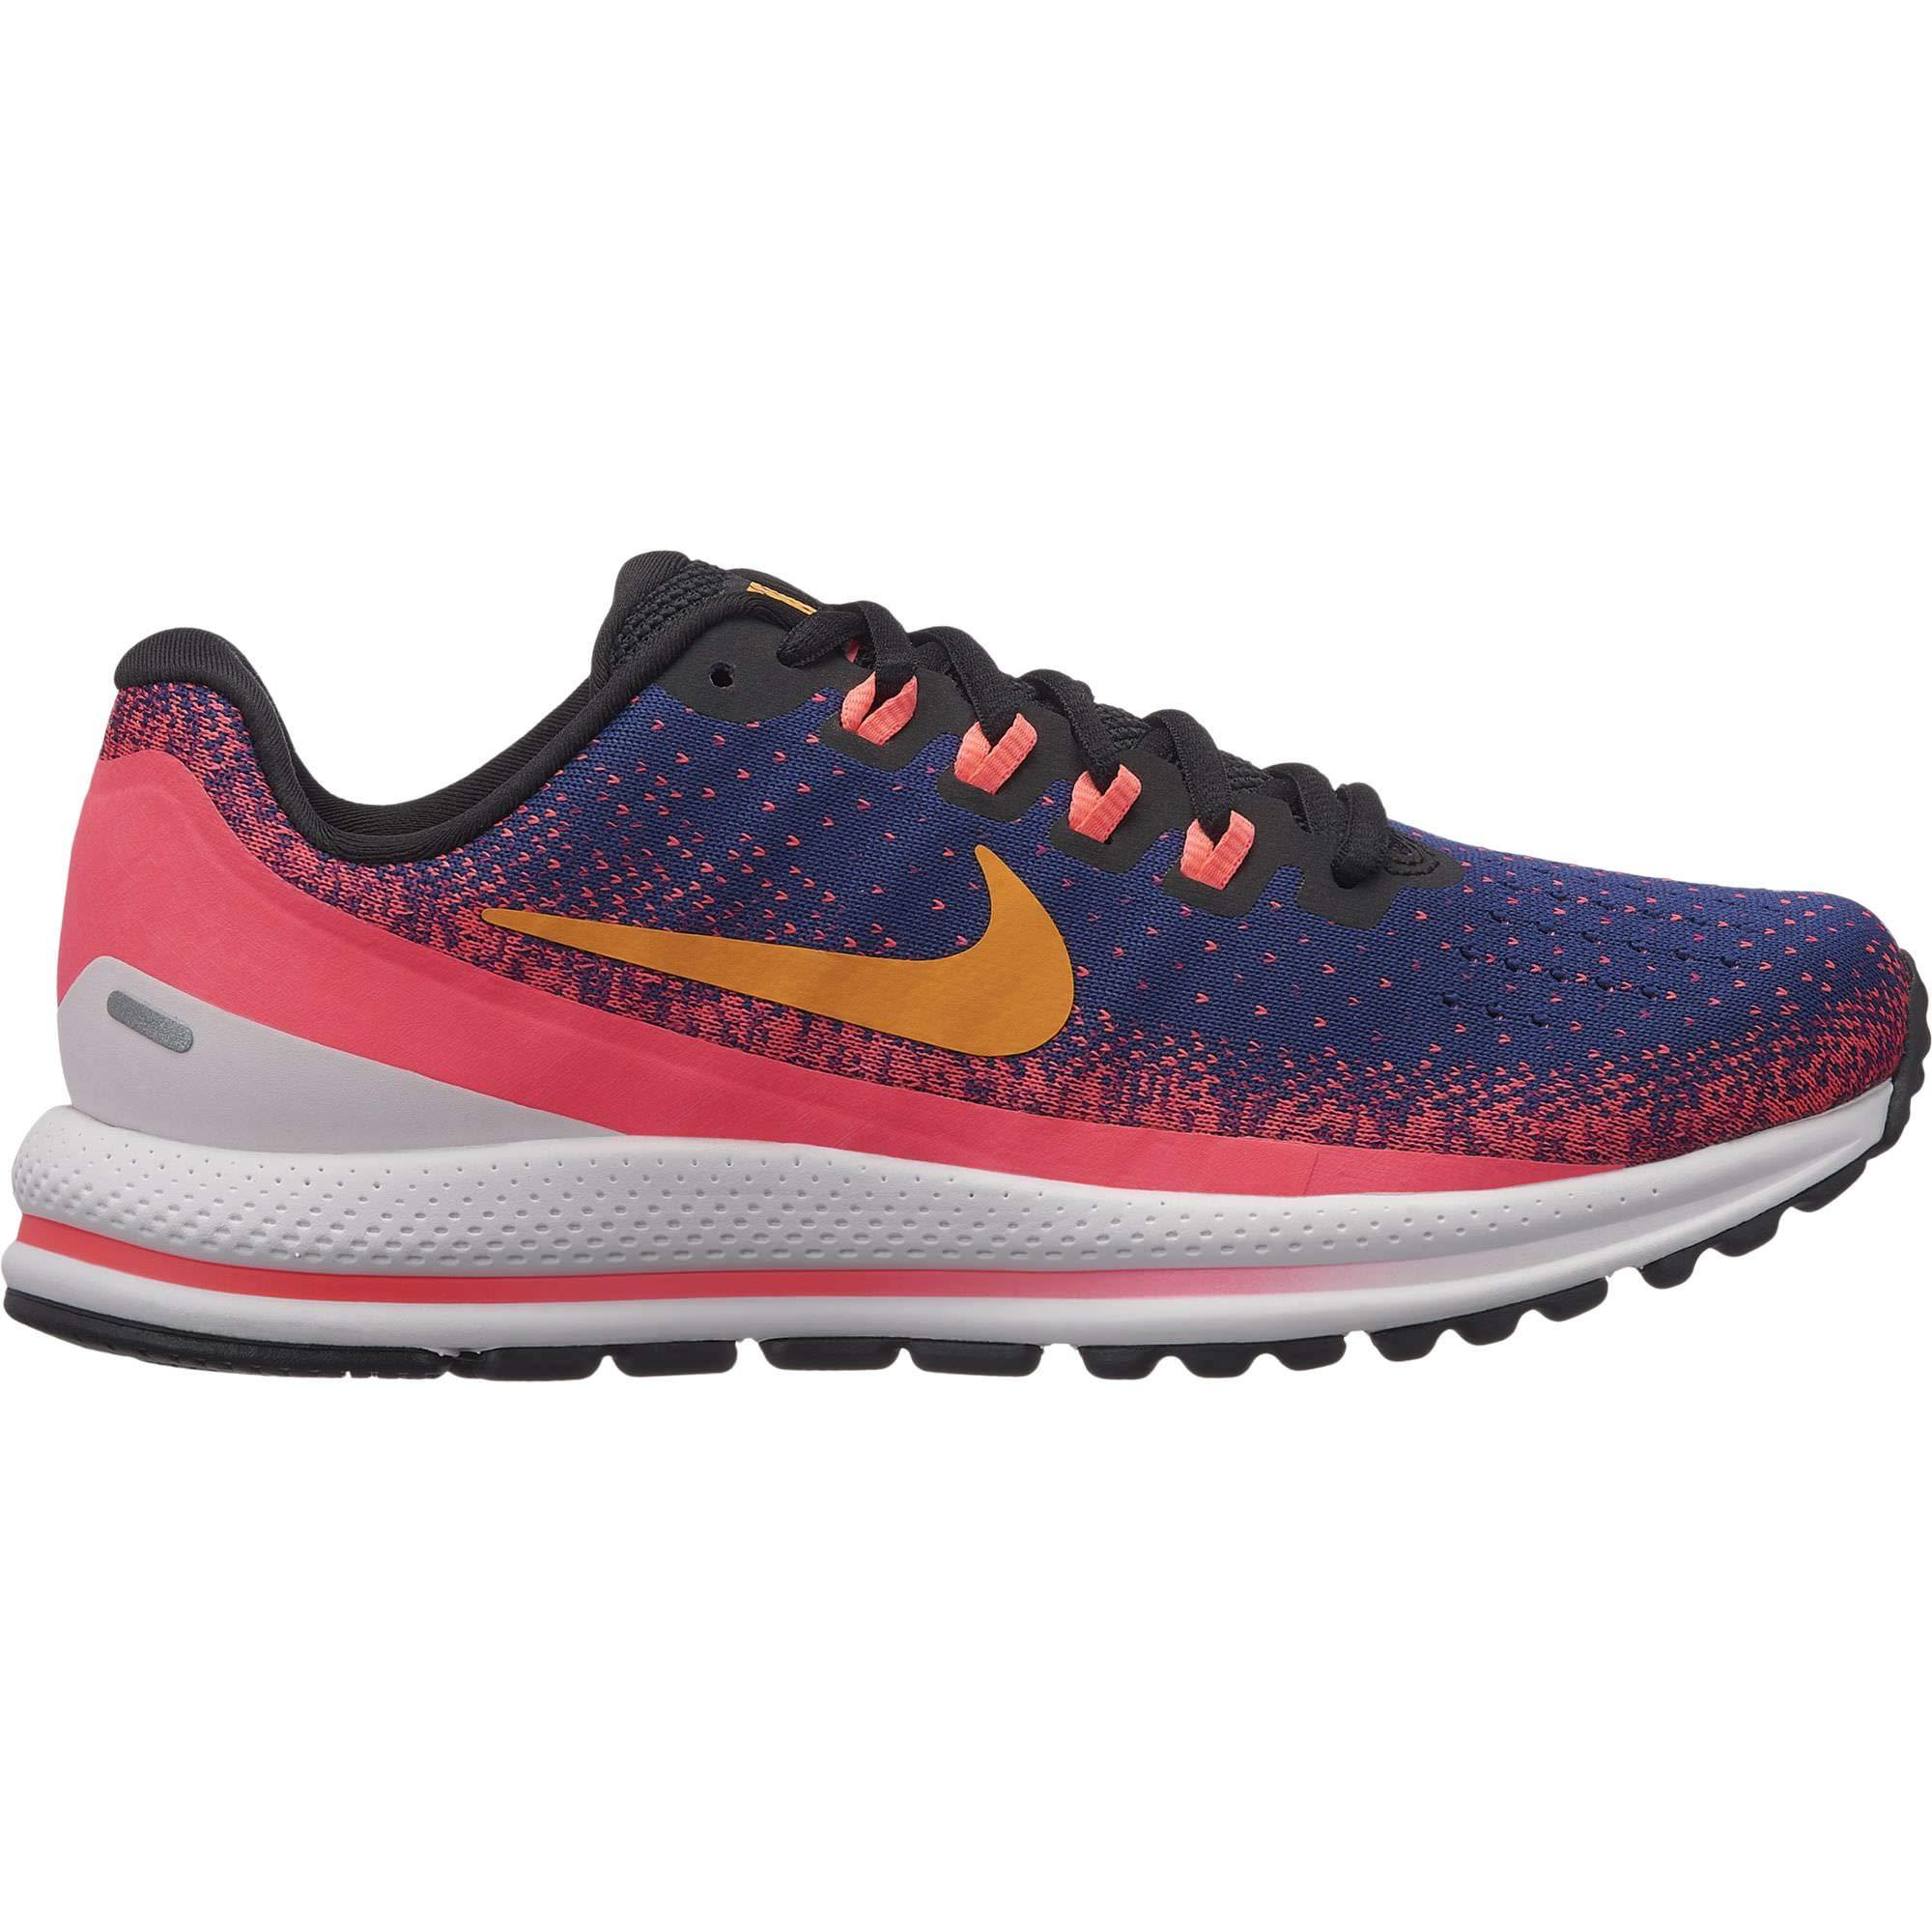 Galleon - NIKE Women s Air Zoom Vomero 13 Running Shoe Blue Void Orange  Peel-Flash Crimson 8.0 6fc575cba